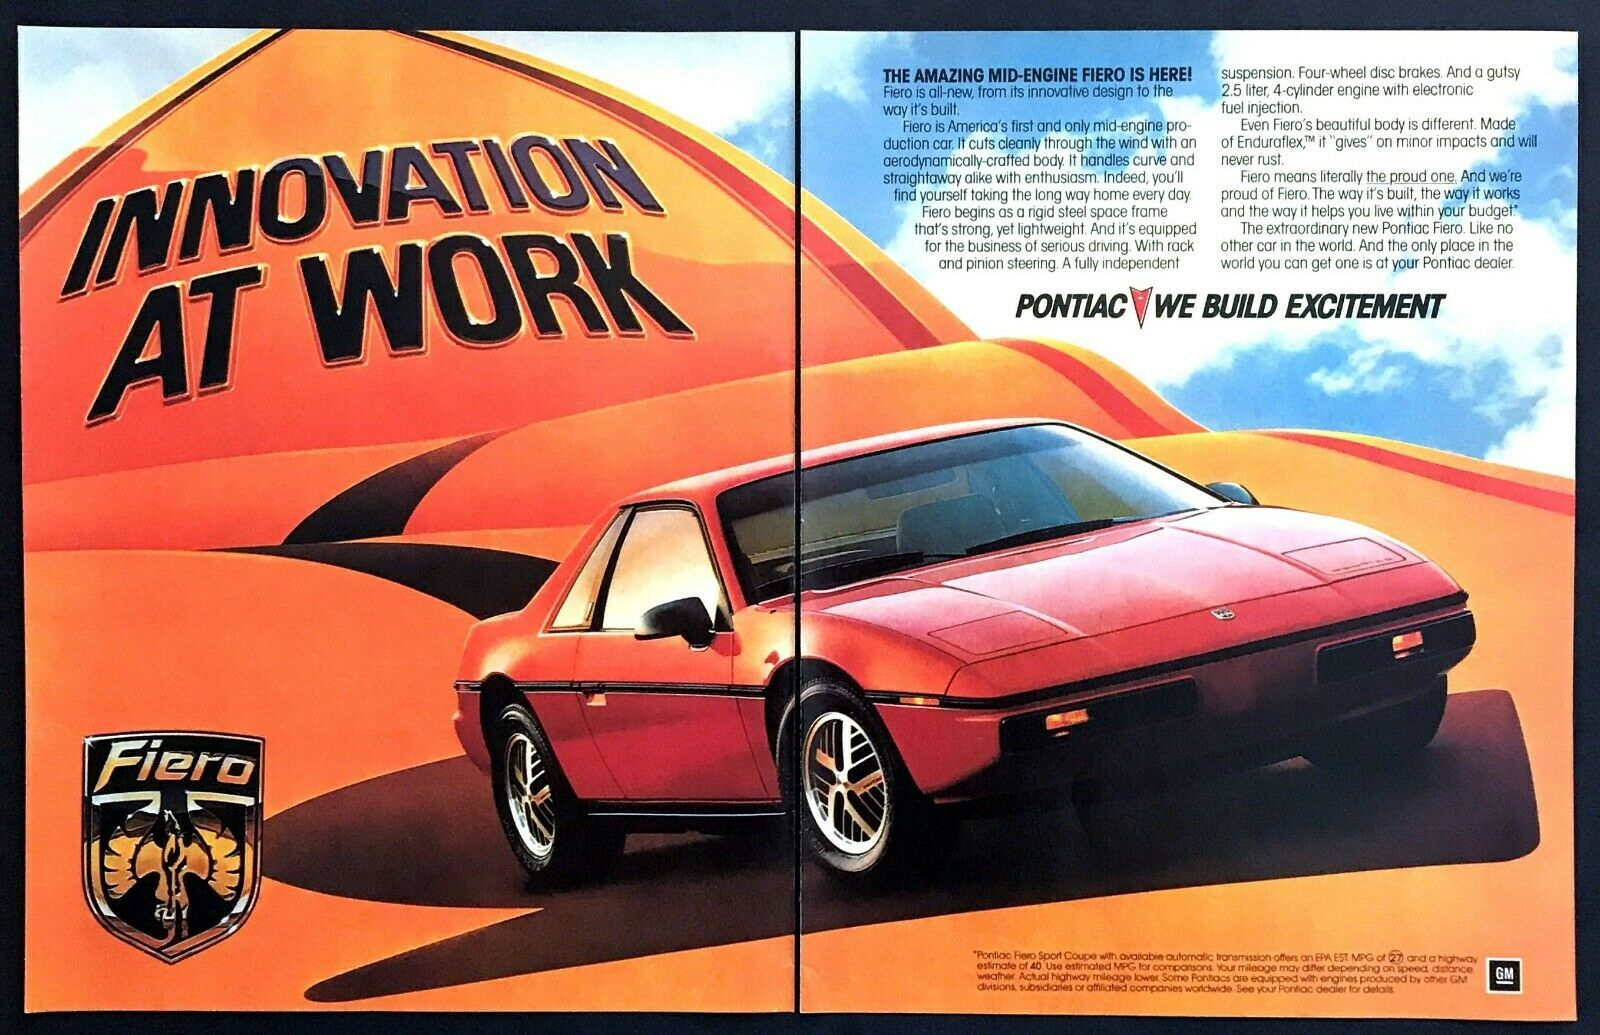 1984-Pontiac-Fiero-Sport-Coupe-photo-Innovation-at.jpg